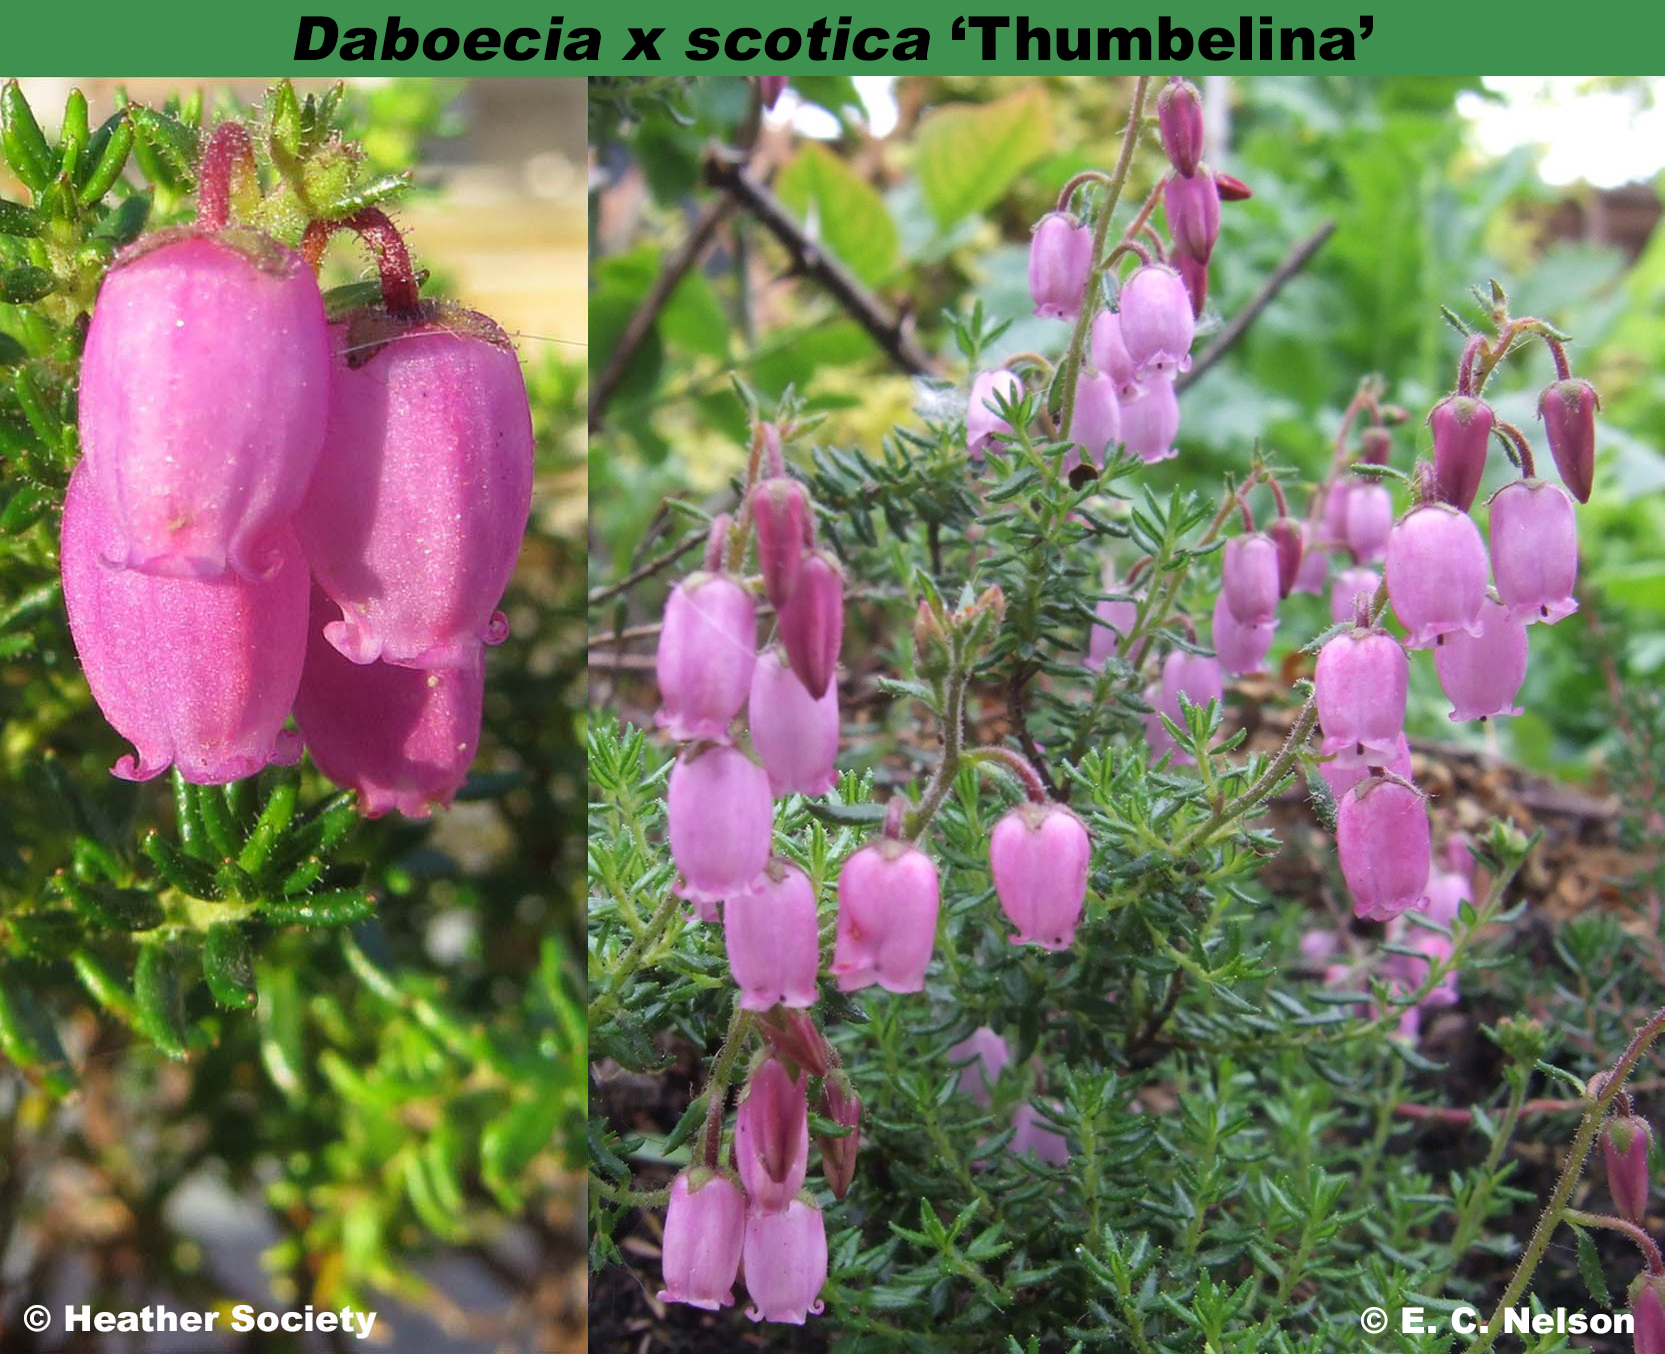 'Thumbelina'